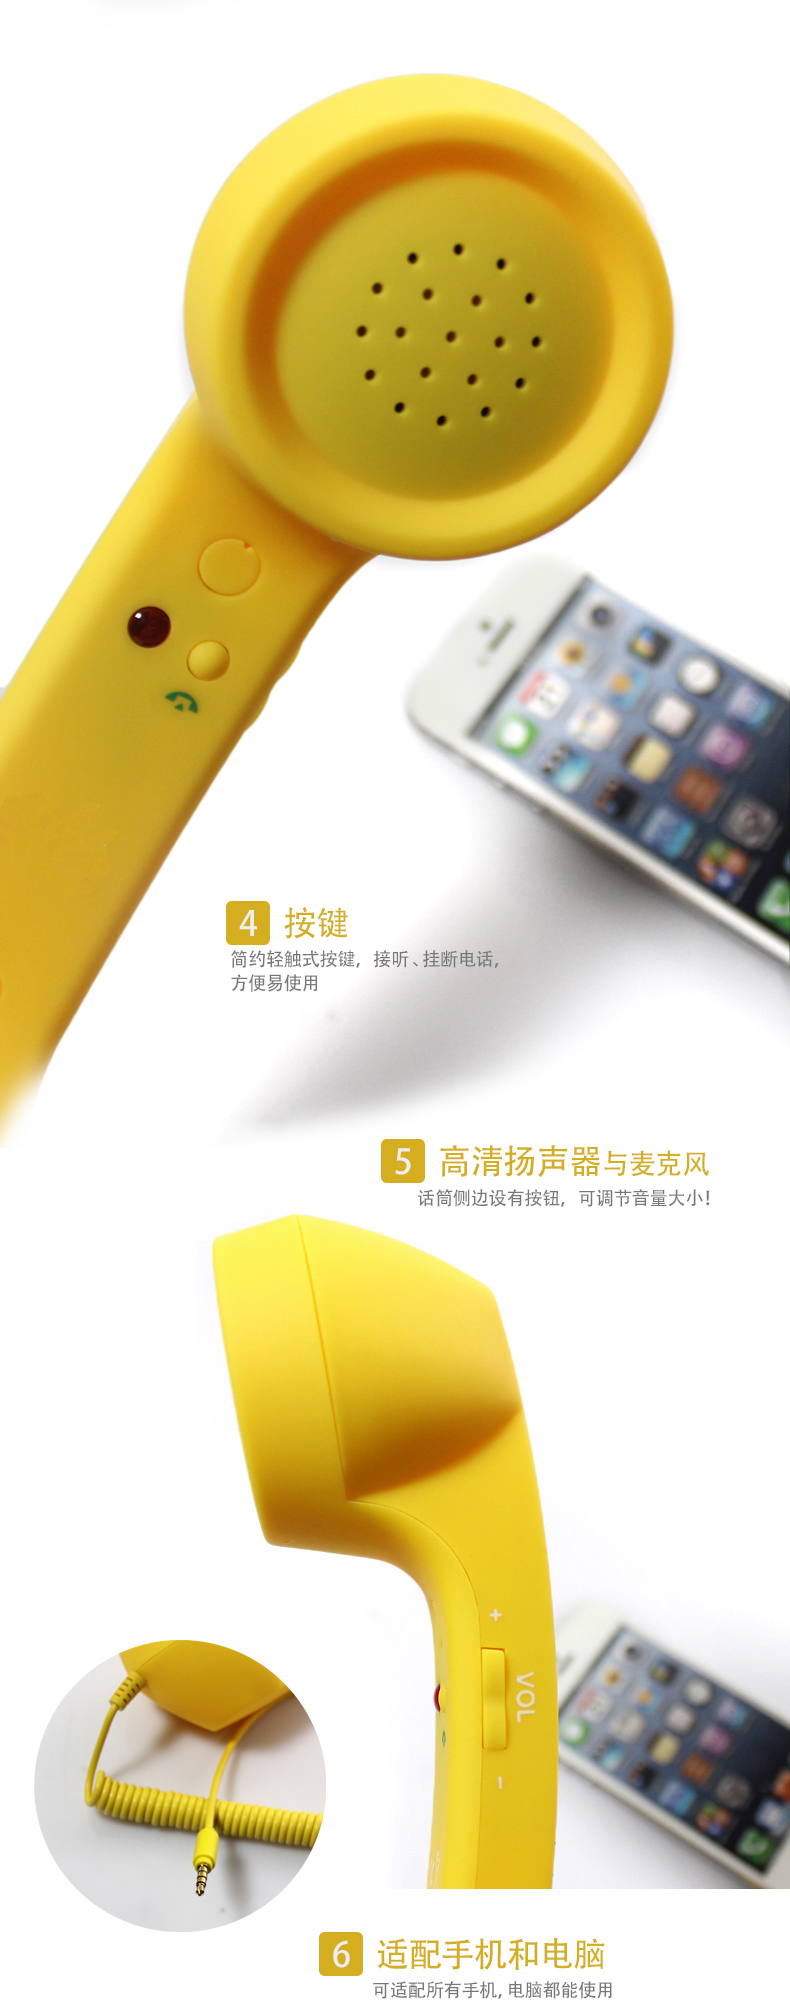 RETRO PHONE (7).jpg